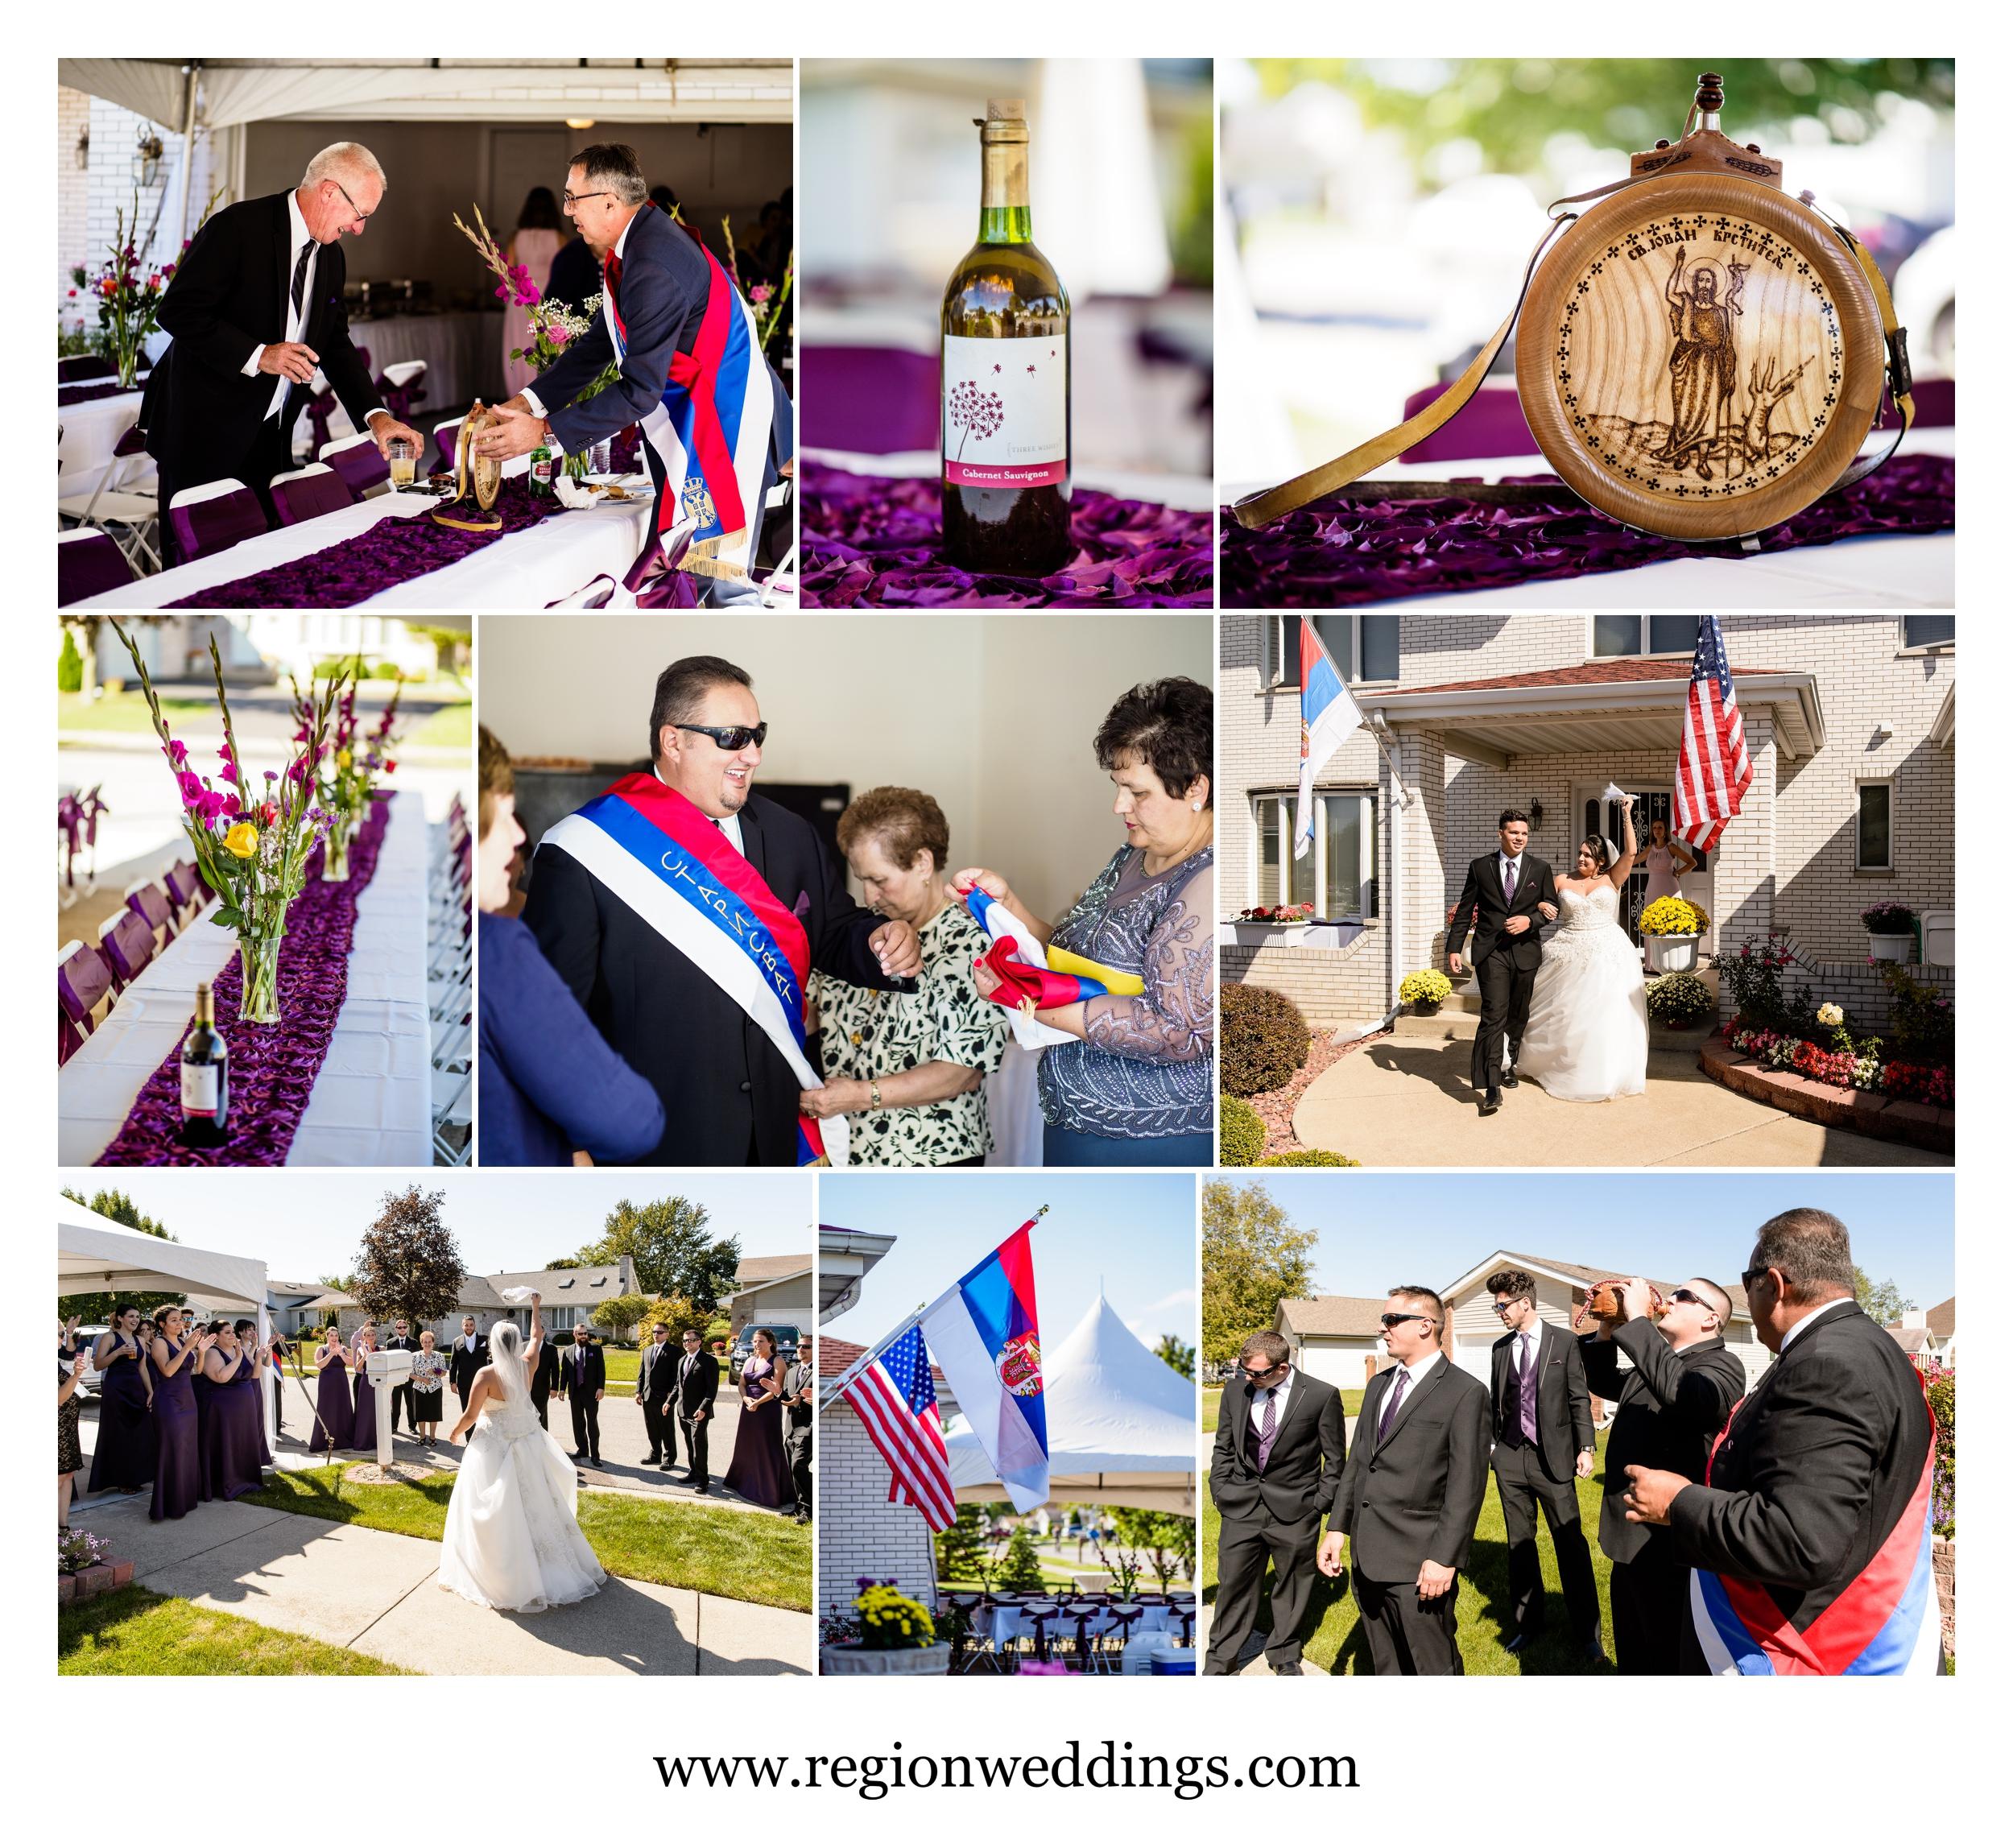 Pre-ceremony celebration at a Serbian wedding.